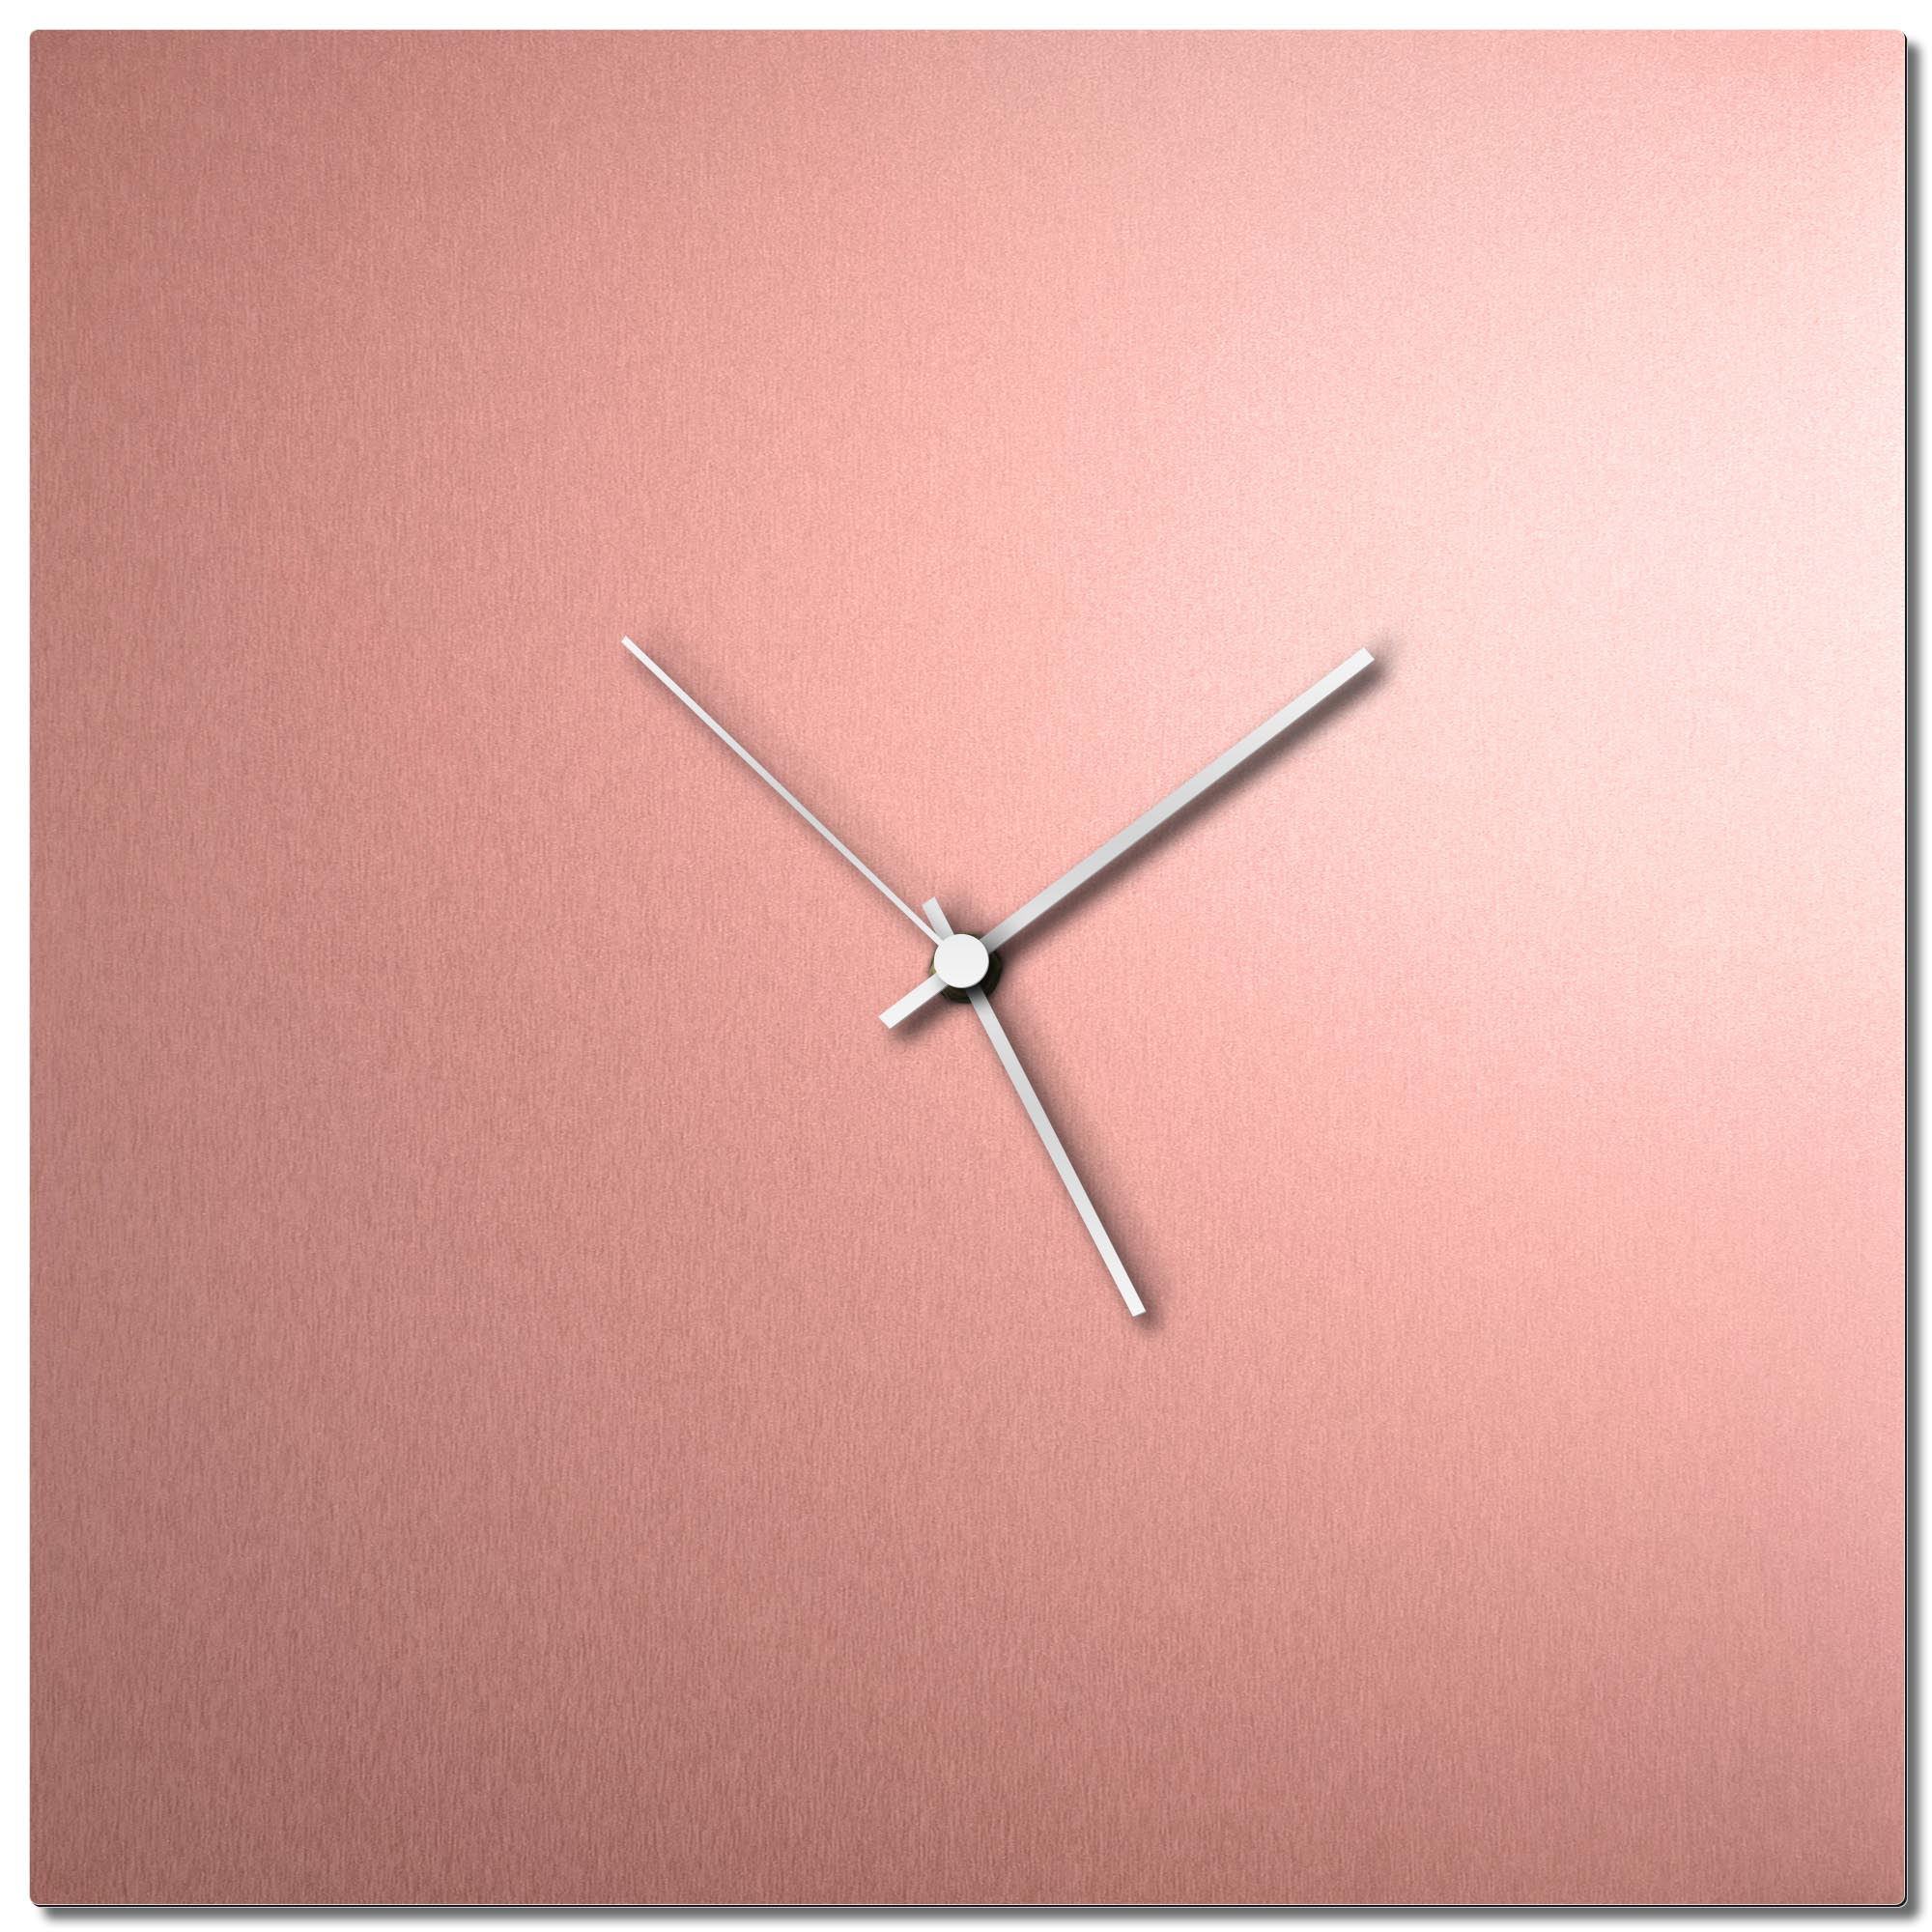 Adam Schwoeppe 'Coppersmith Square Clock White' Midcentury Modern Style Wall Clock